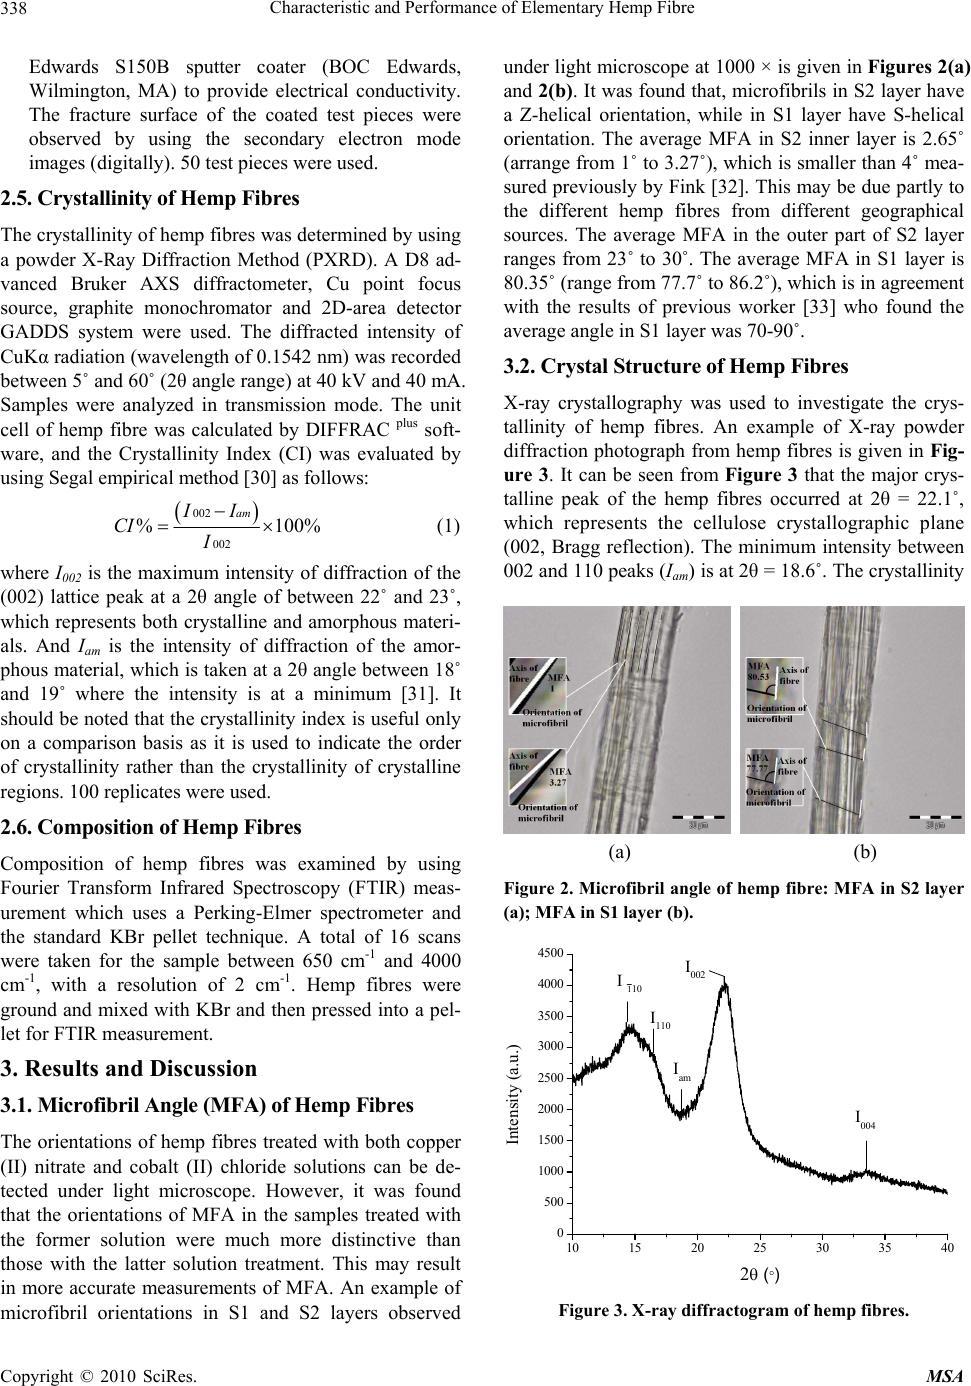 Characteristic and Performance of Elementary Hemp Fibre - 웹